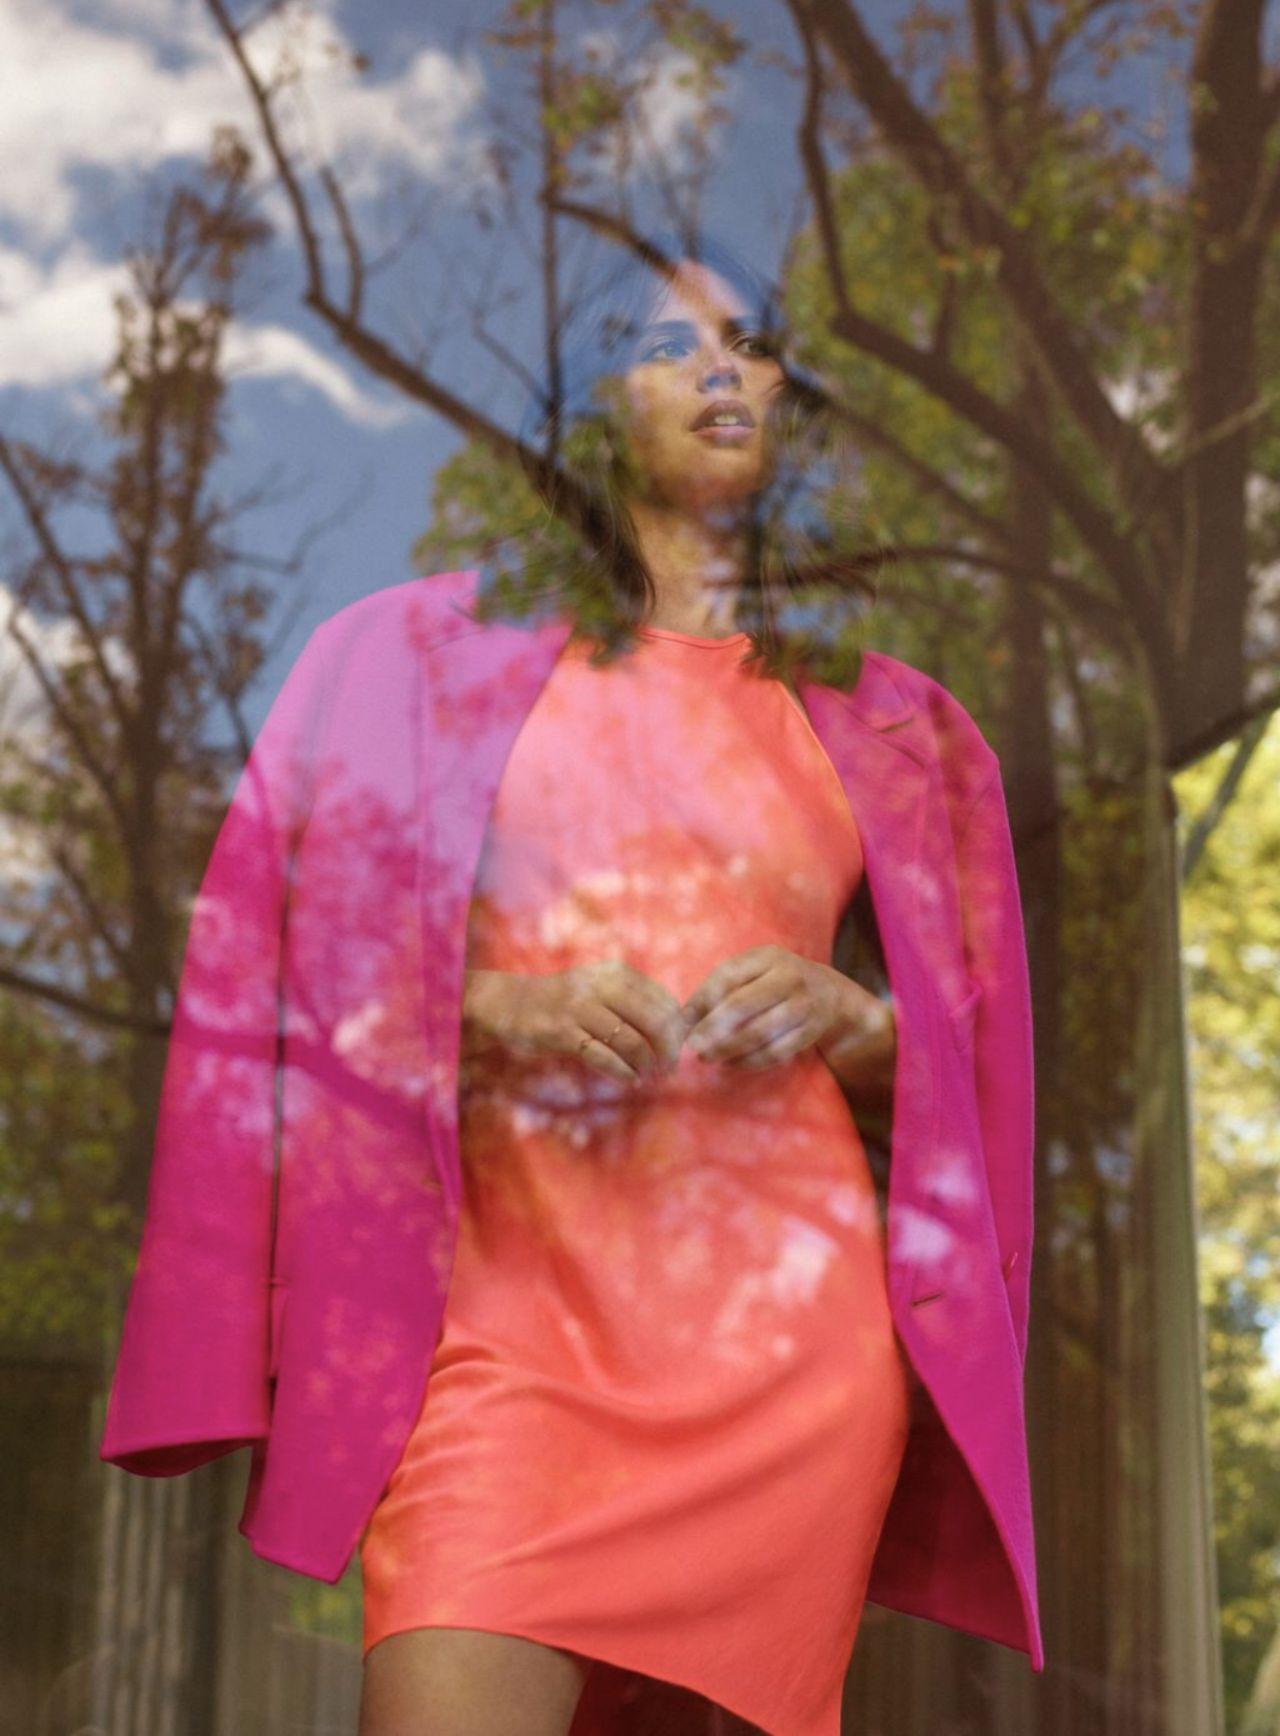 felicity-jones-covers-shape-magazine-us-january-february-2020-photos